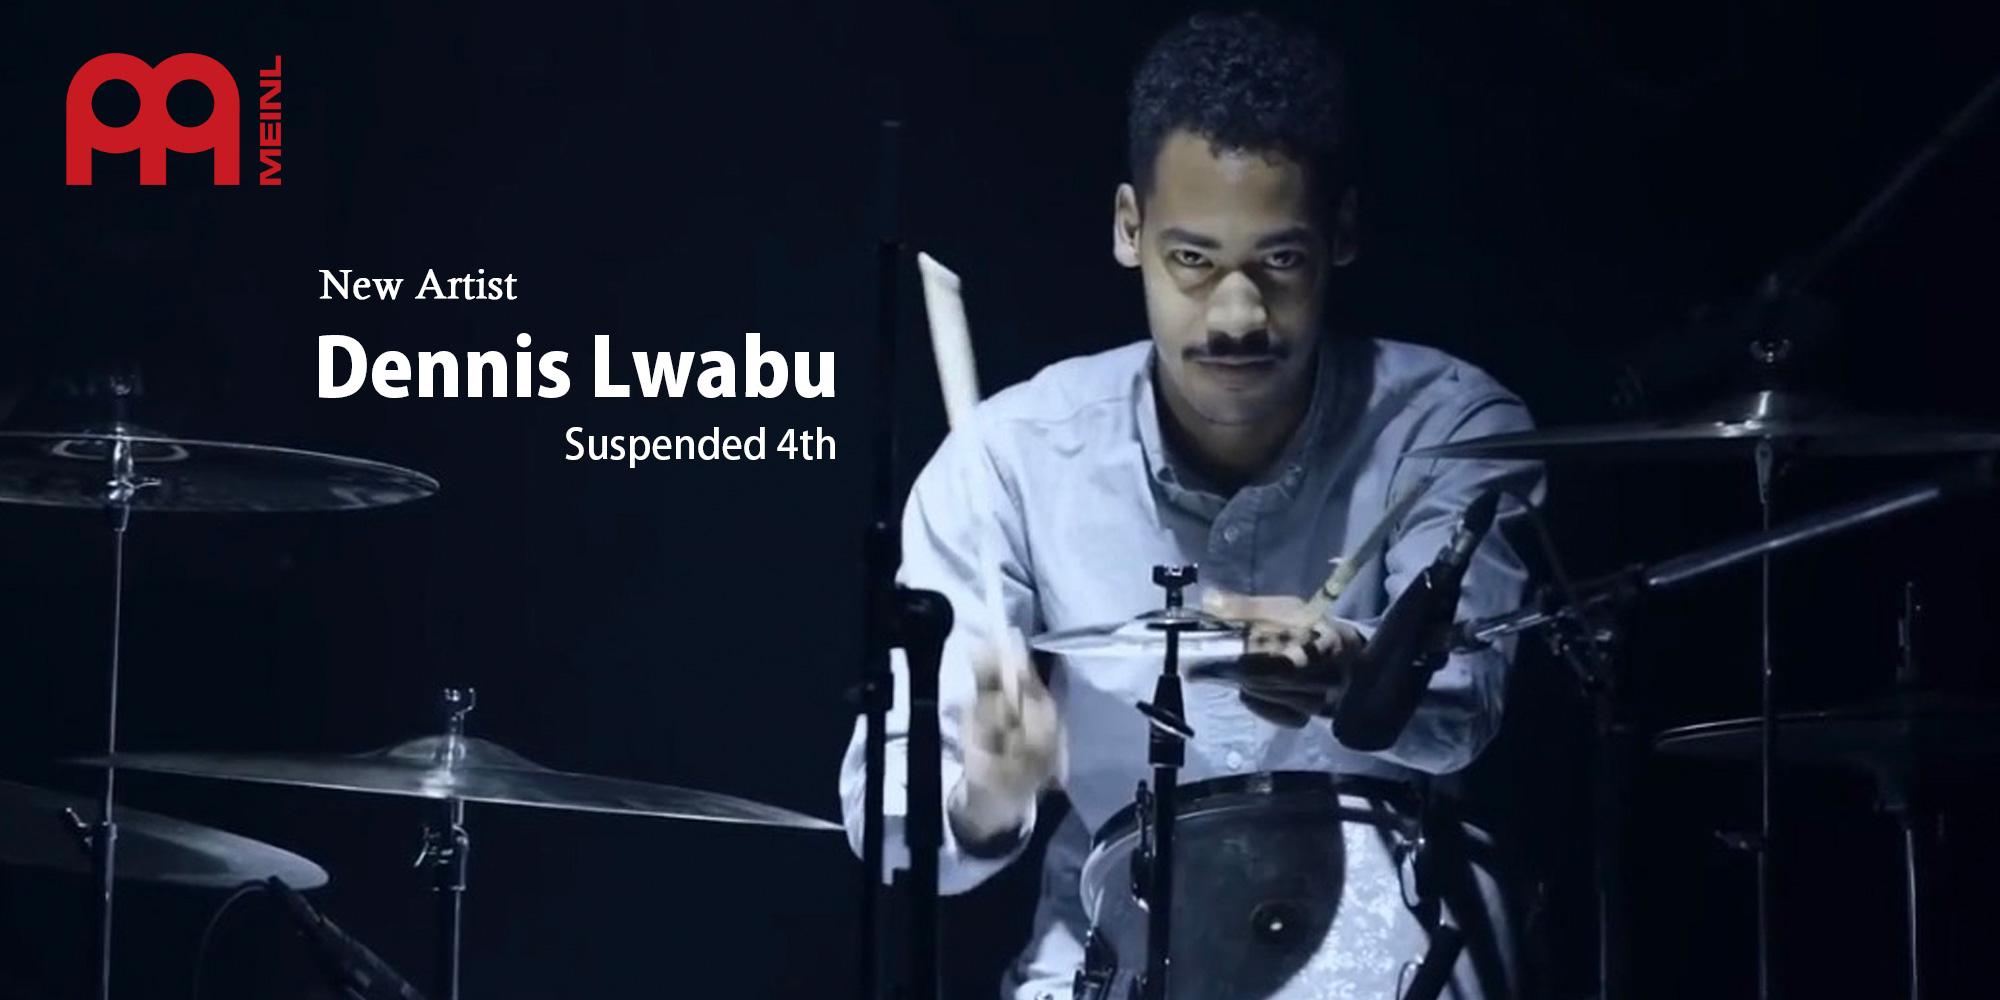 Dennis Lwabuさん(Suspended 4th)が新たに MEINL ファミリーになりました!